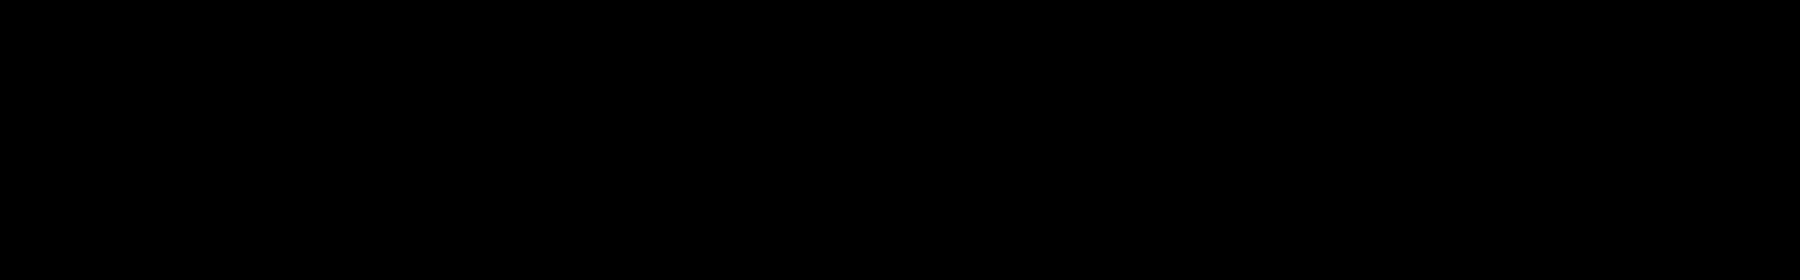 Plasma audio waveform